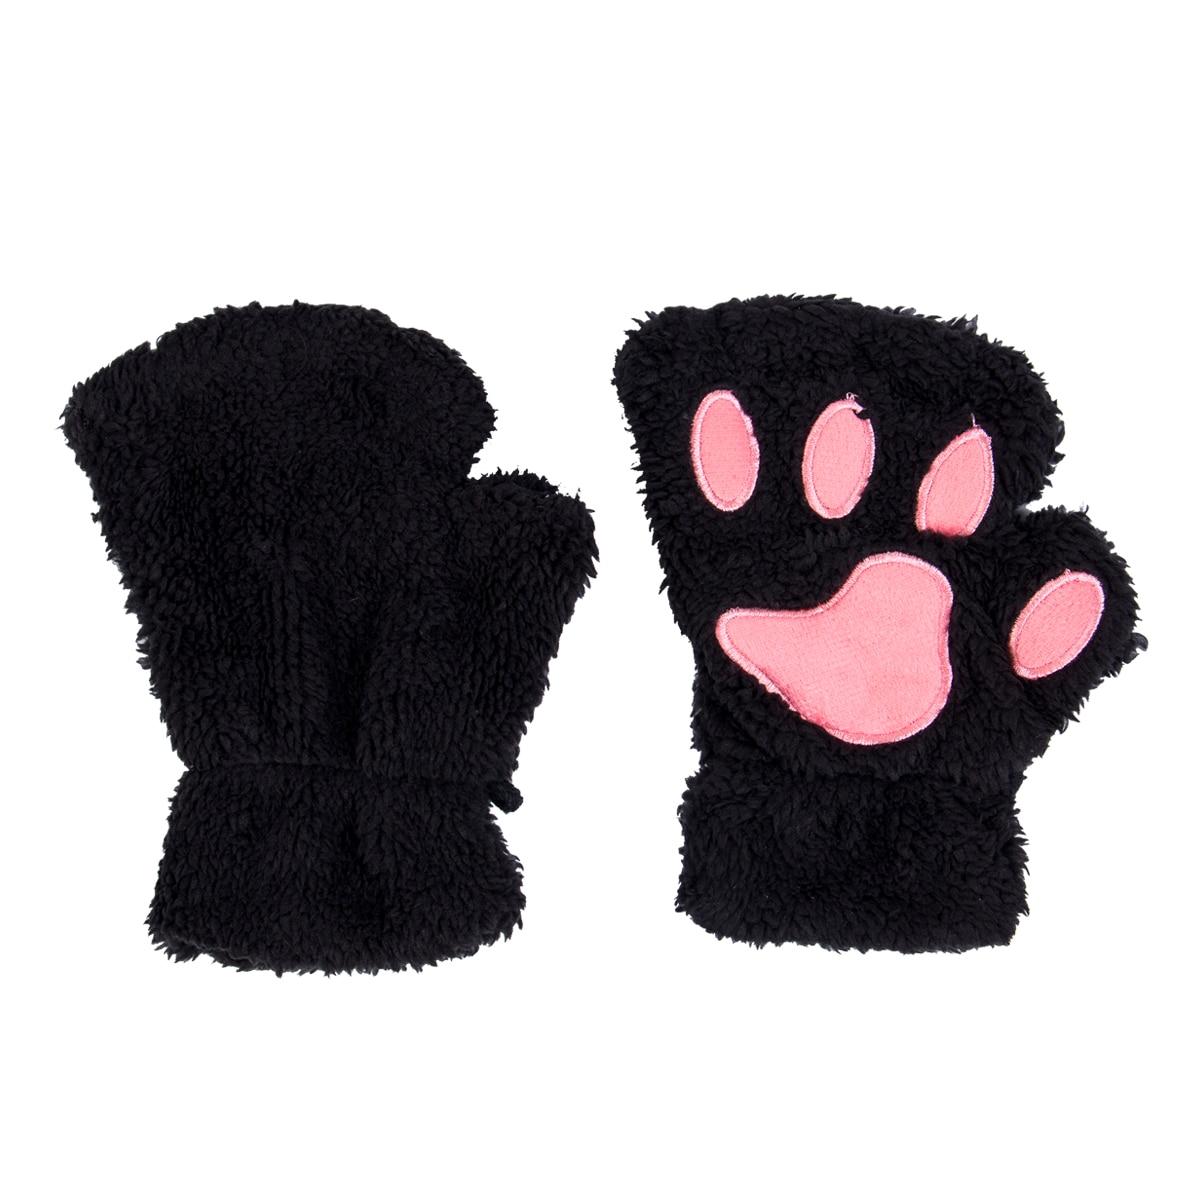 Cat Claw Paw Gloves Lovely Women Warm Winter Mitten Plush Glove Costume Half Finger Soft Gloves for Girls